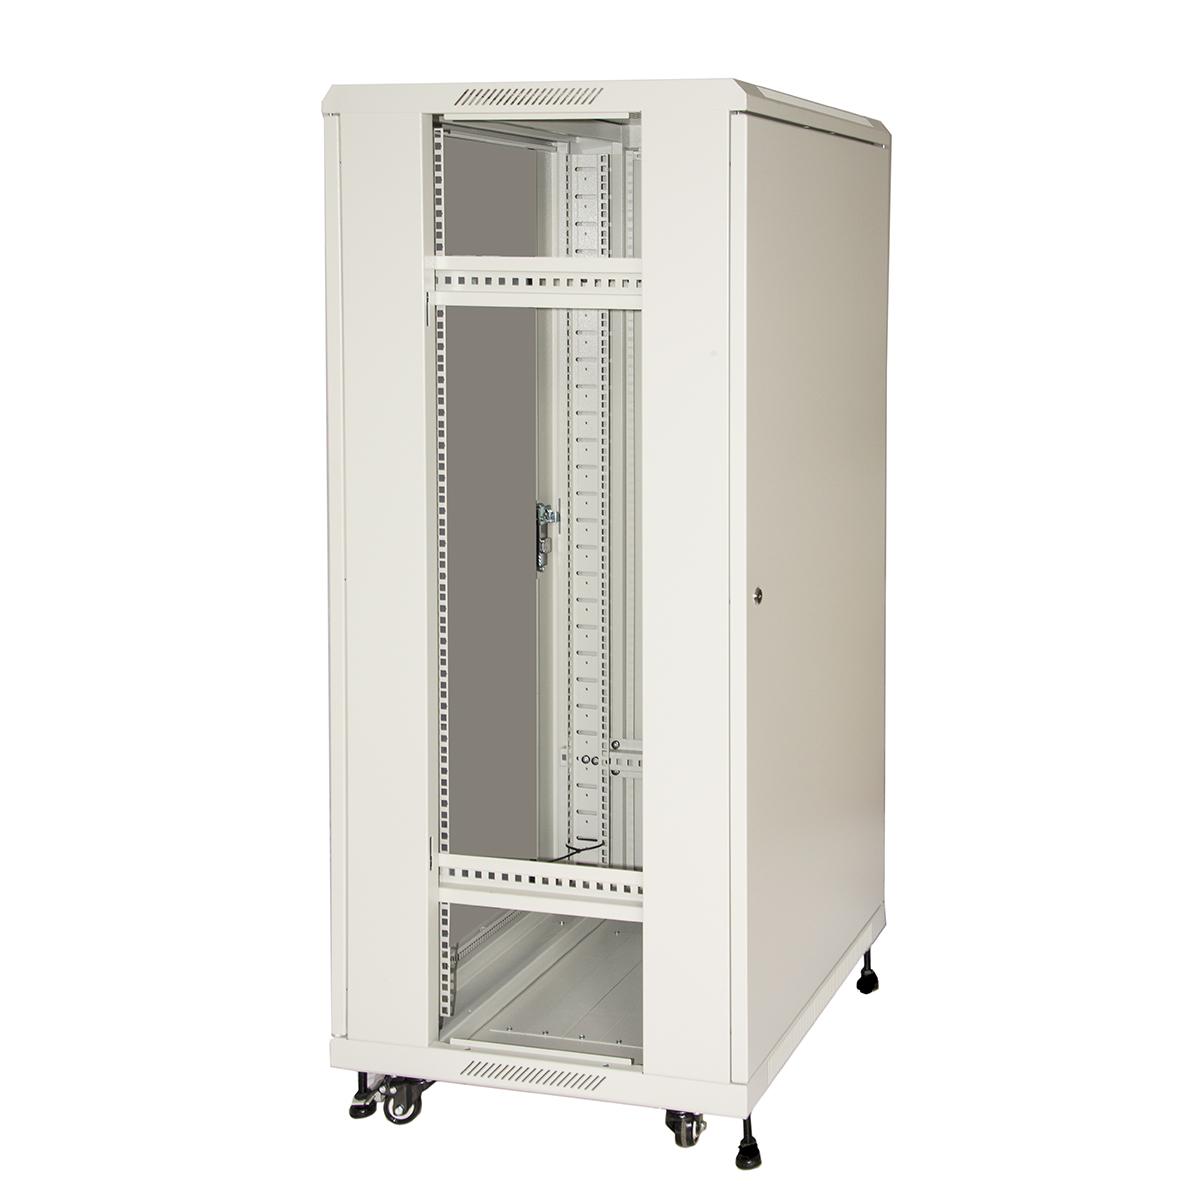 Armadio rack 19″ 27u (a)1388 (l)600 (p)600 colore grigio porta metallo pieno